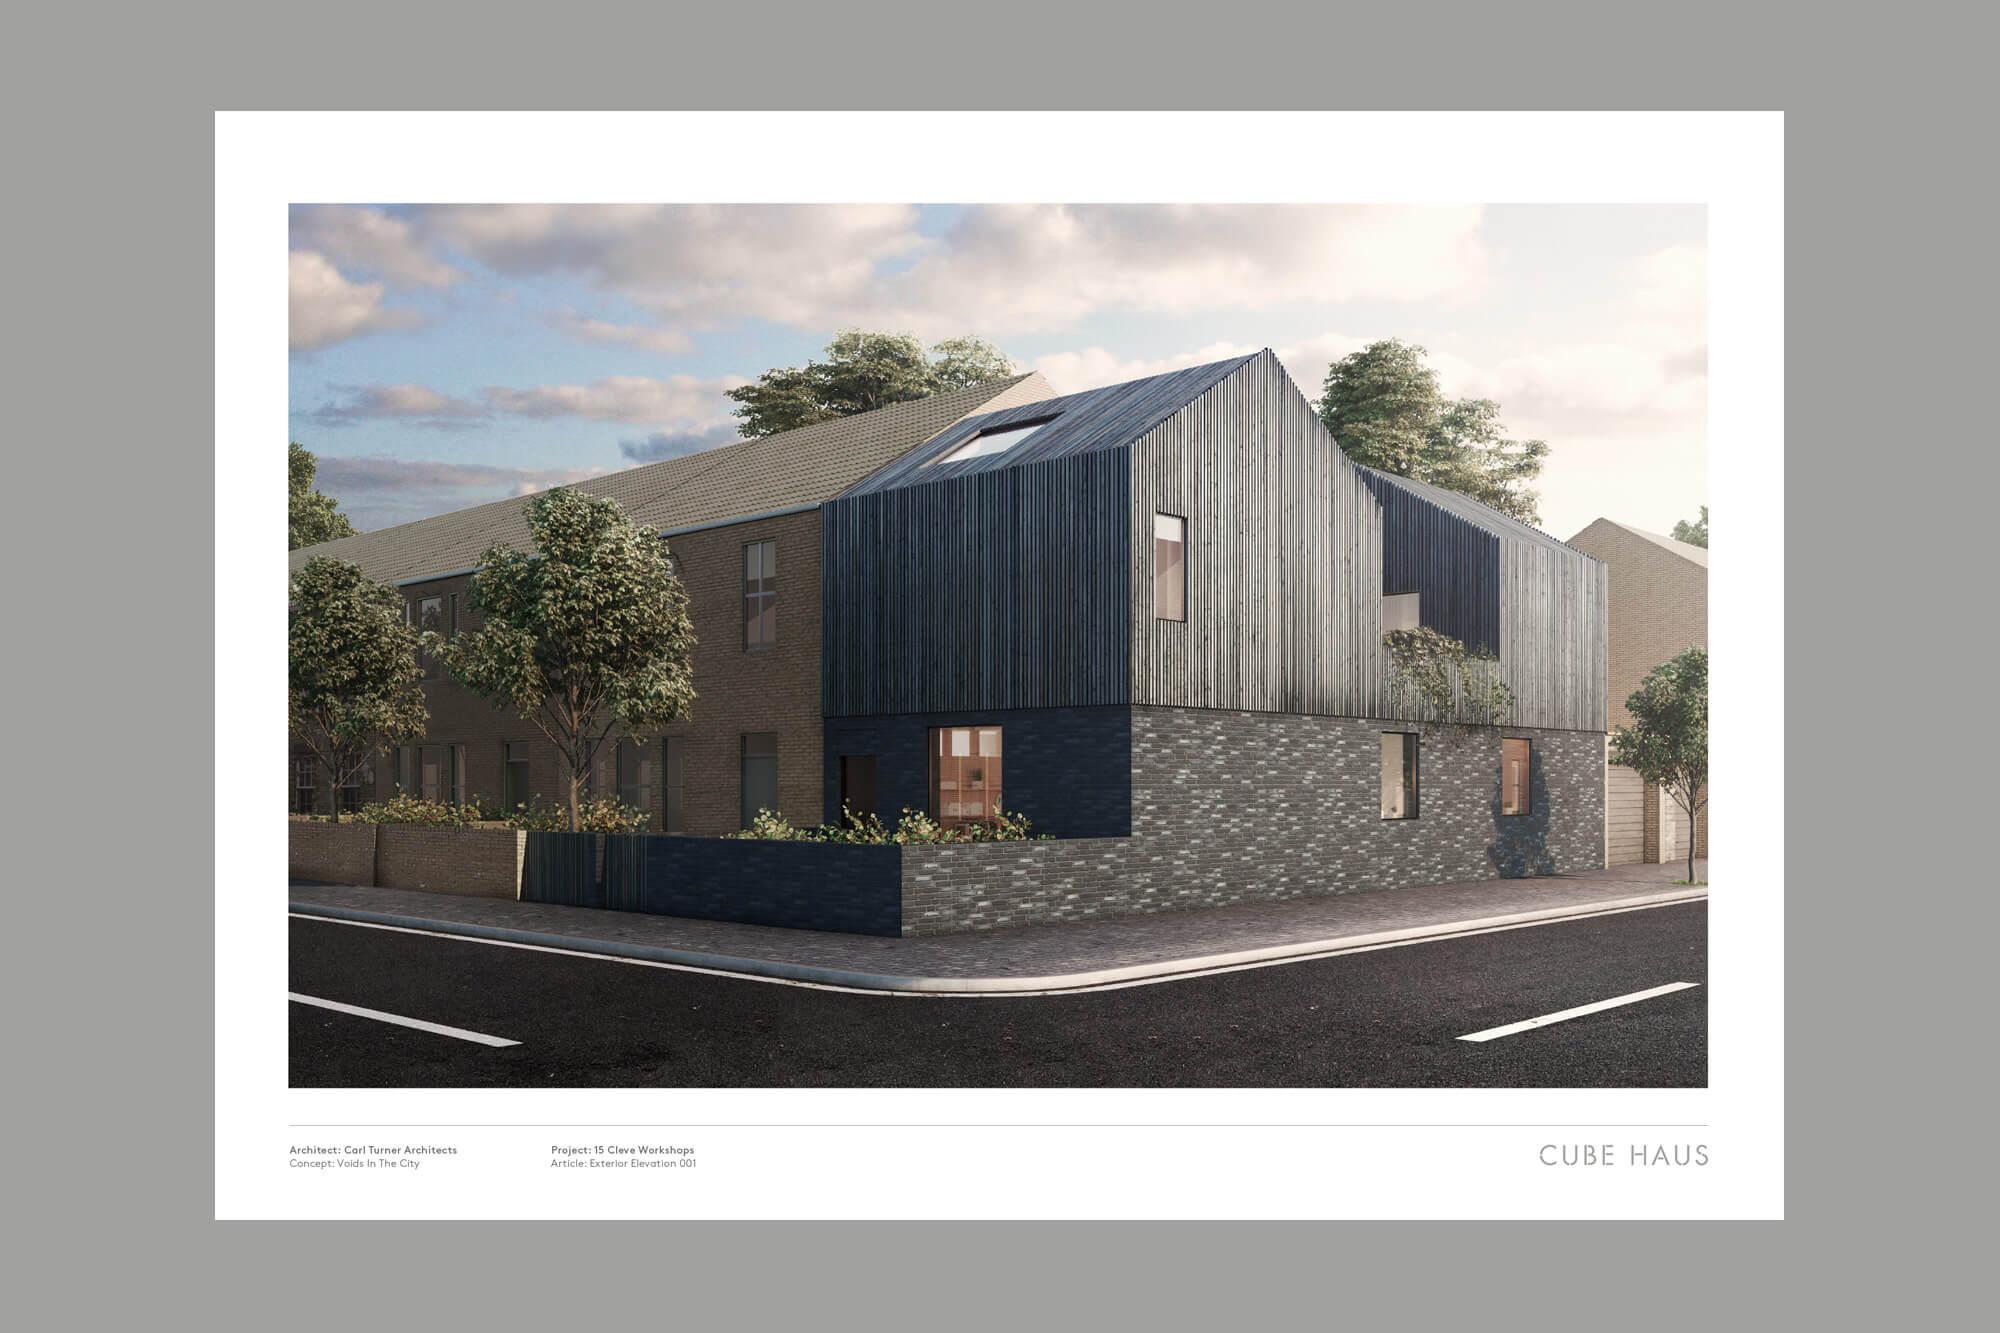 gpj-studio-cube-haus-architects-website-cs-10